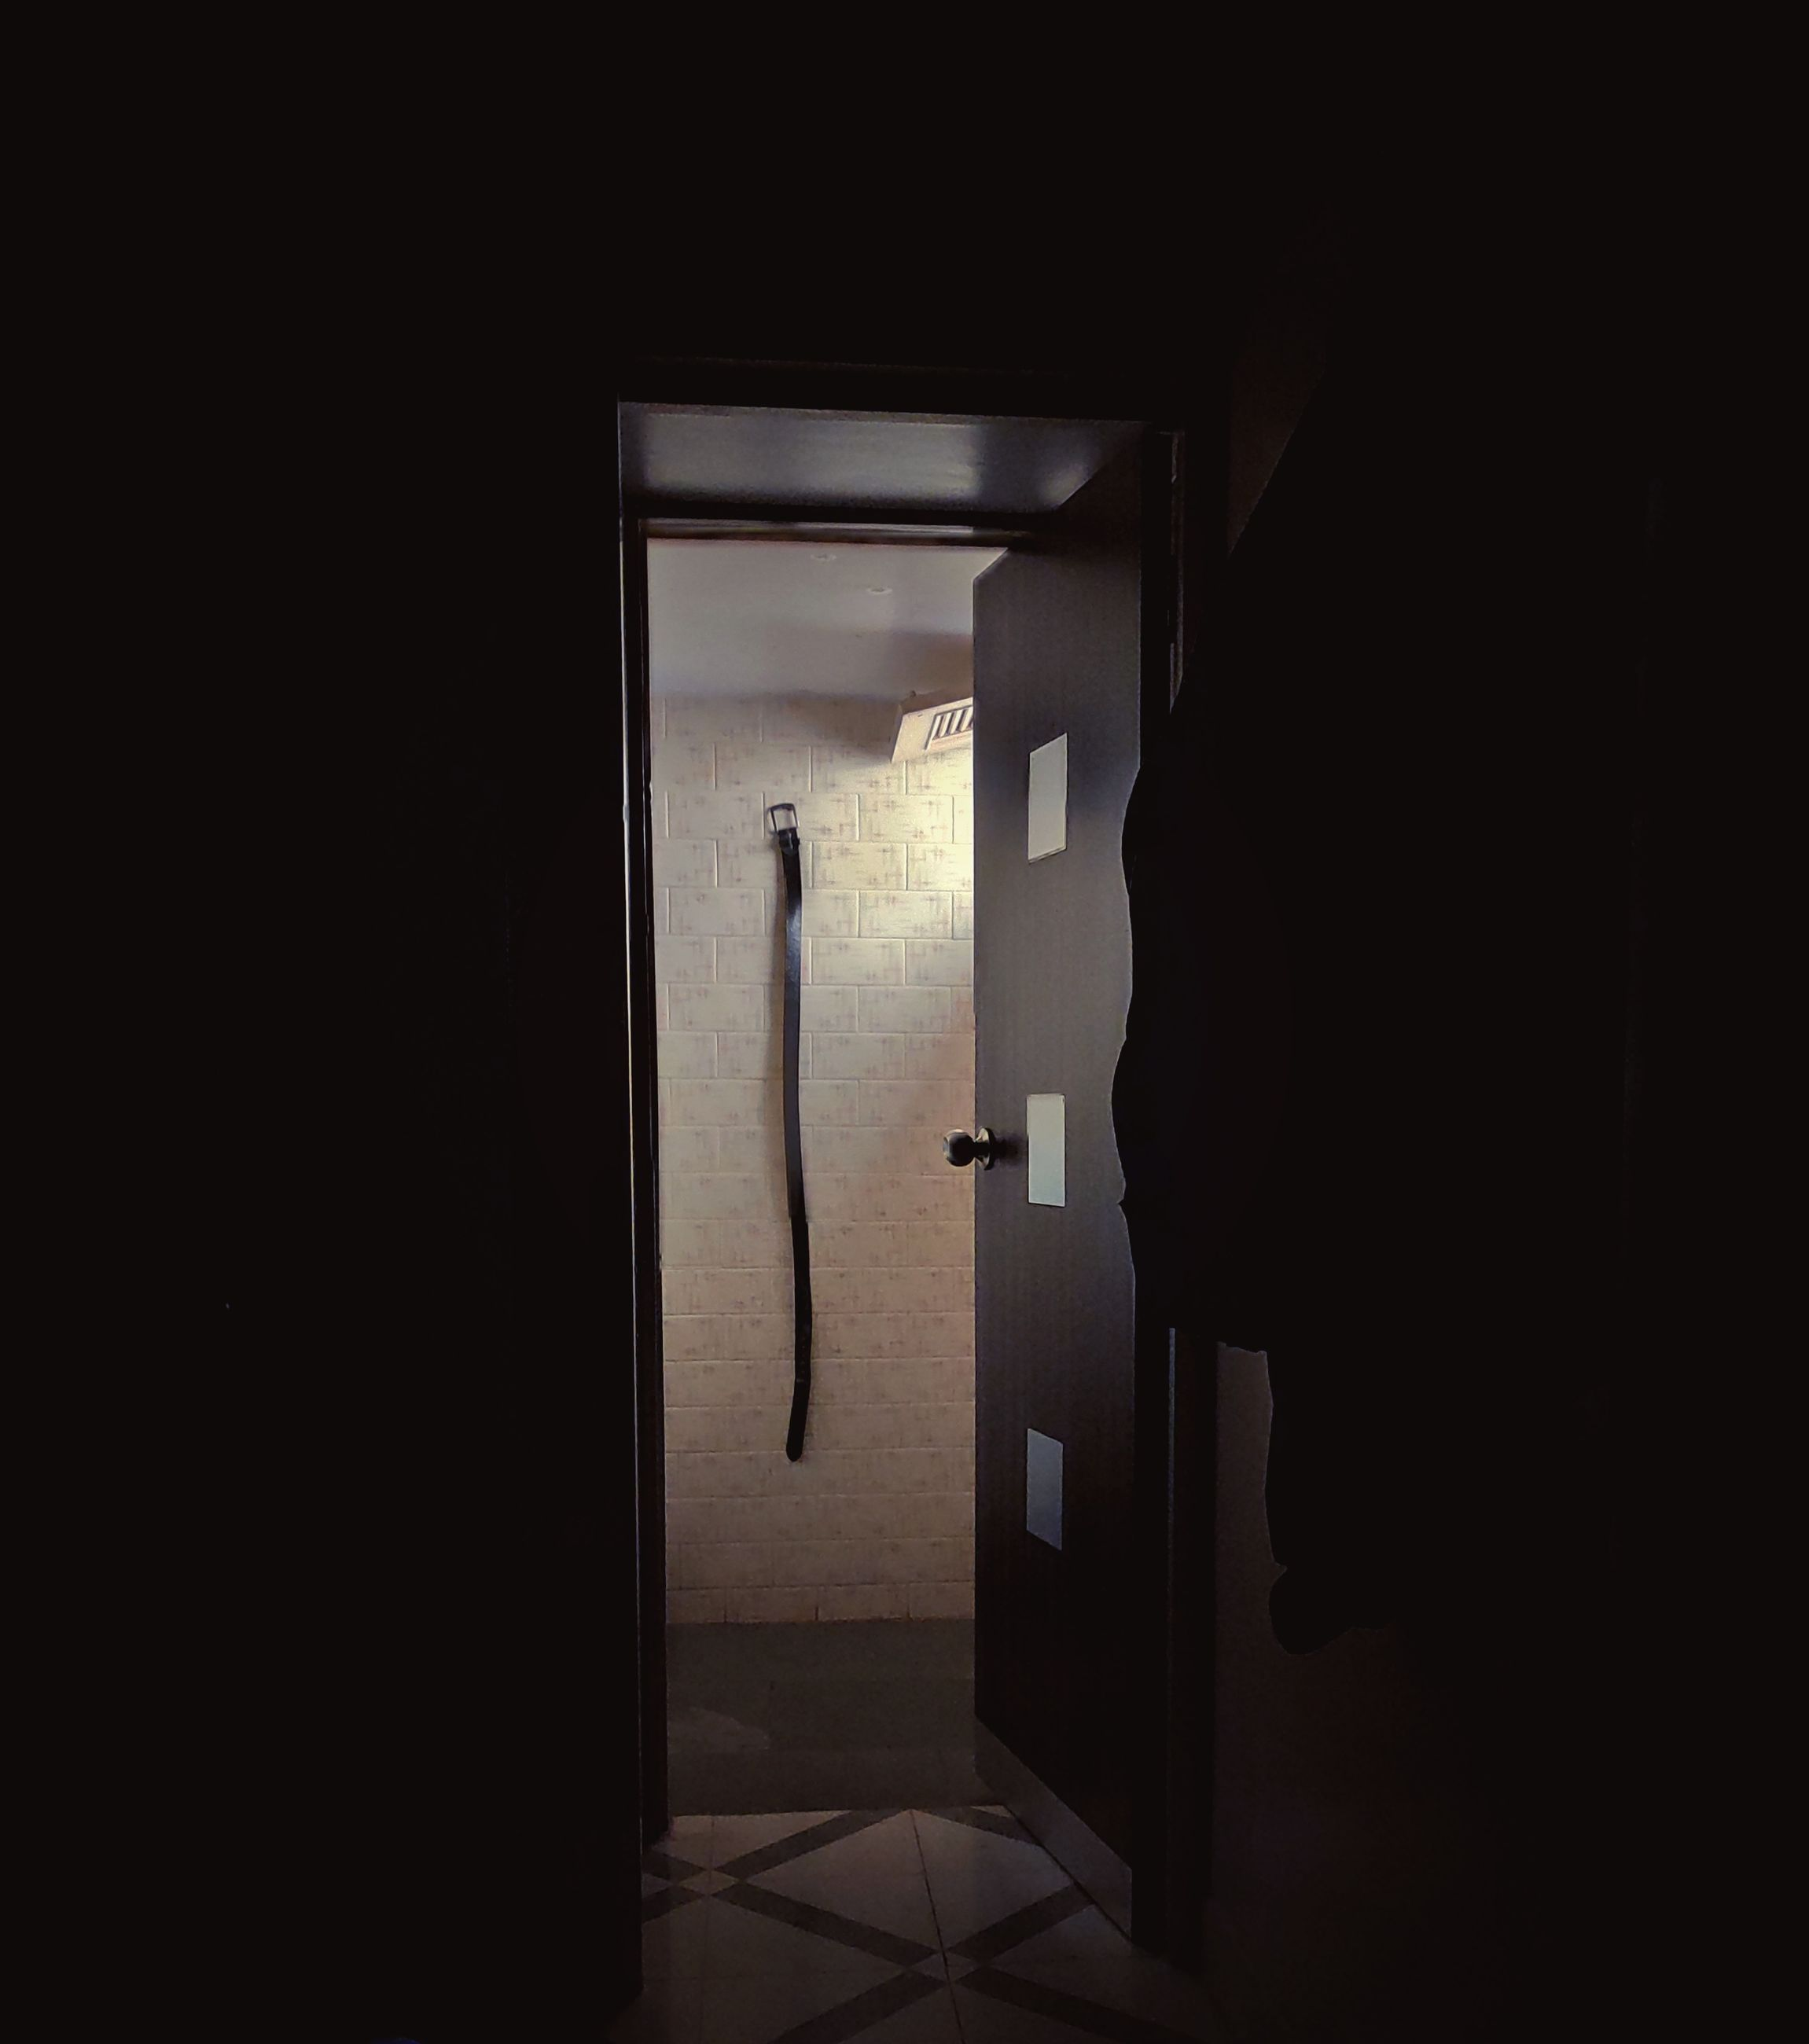 indoors, entrance, door, dark, domestic room, home, home interior, open, darkroom, one person, lifestyles, bathroom, real people, architecture, shadow, toilet, copy space, doorway, flooring